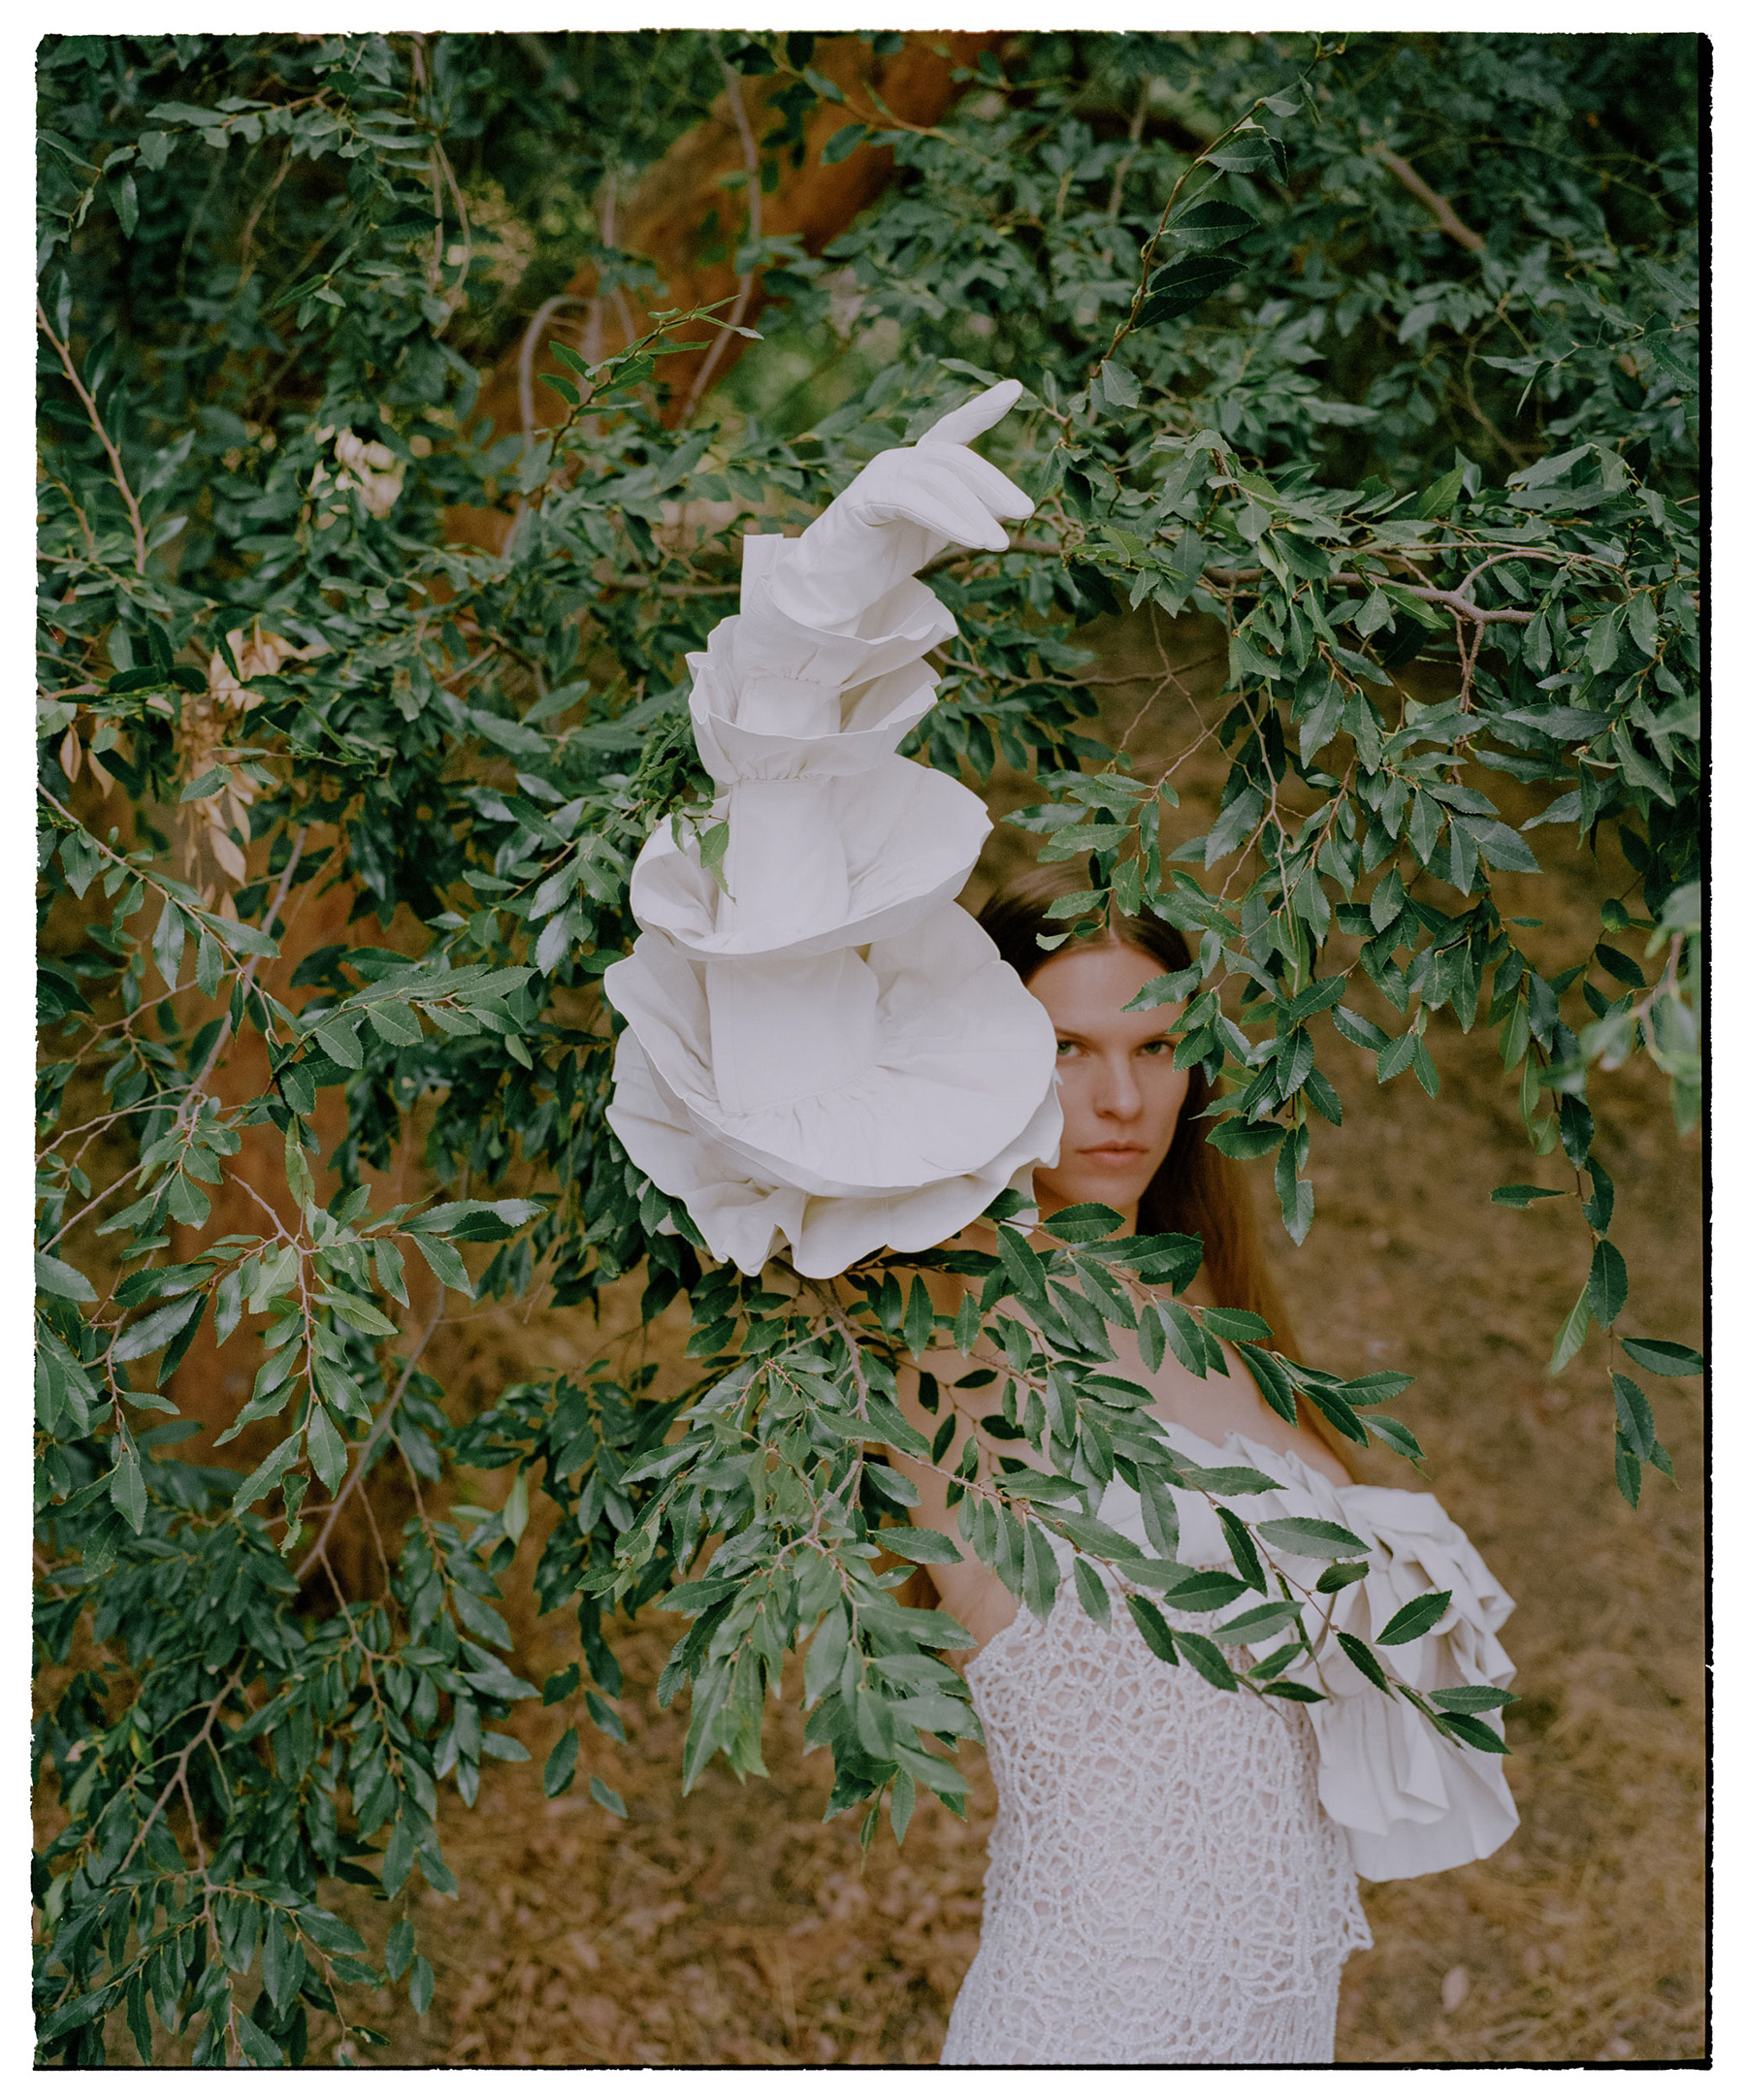 iGNANT-Photography-John-Clayton-Lee-Selection-006